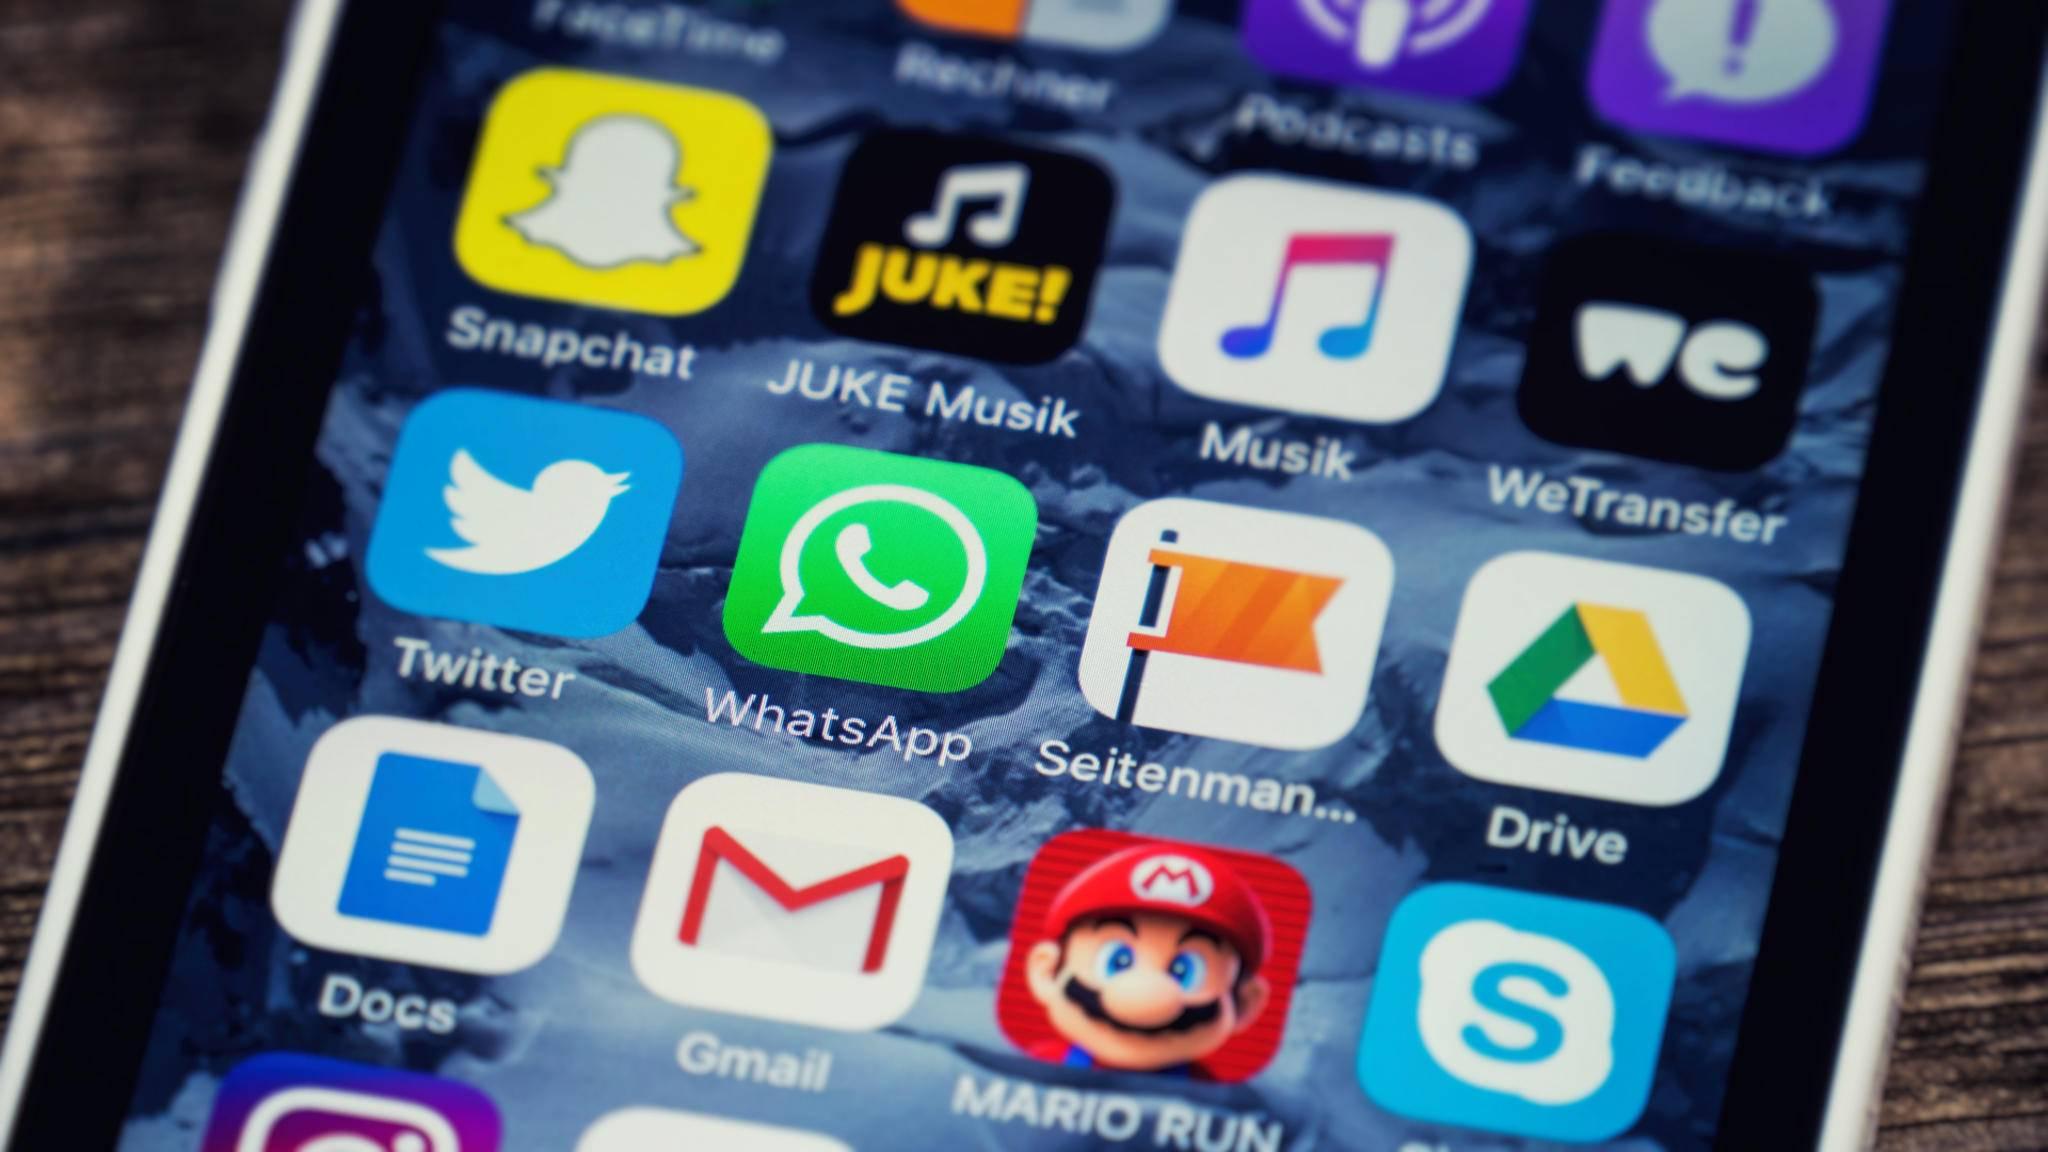 Wie viele Daten fressen Deine Lieblings-Apps?